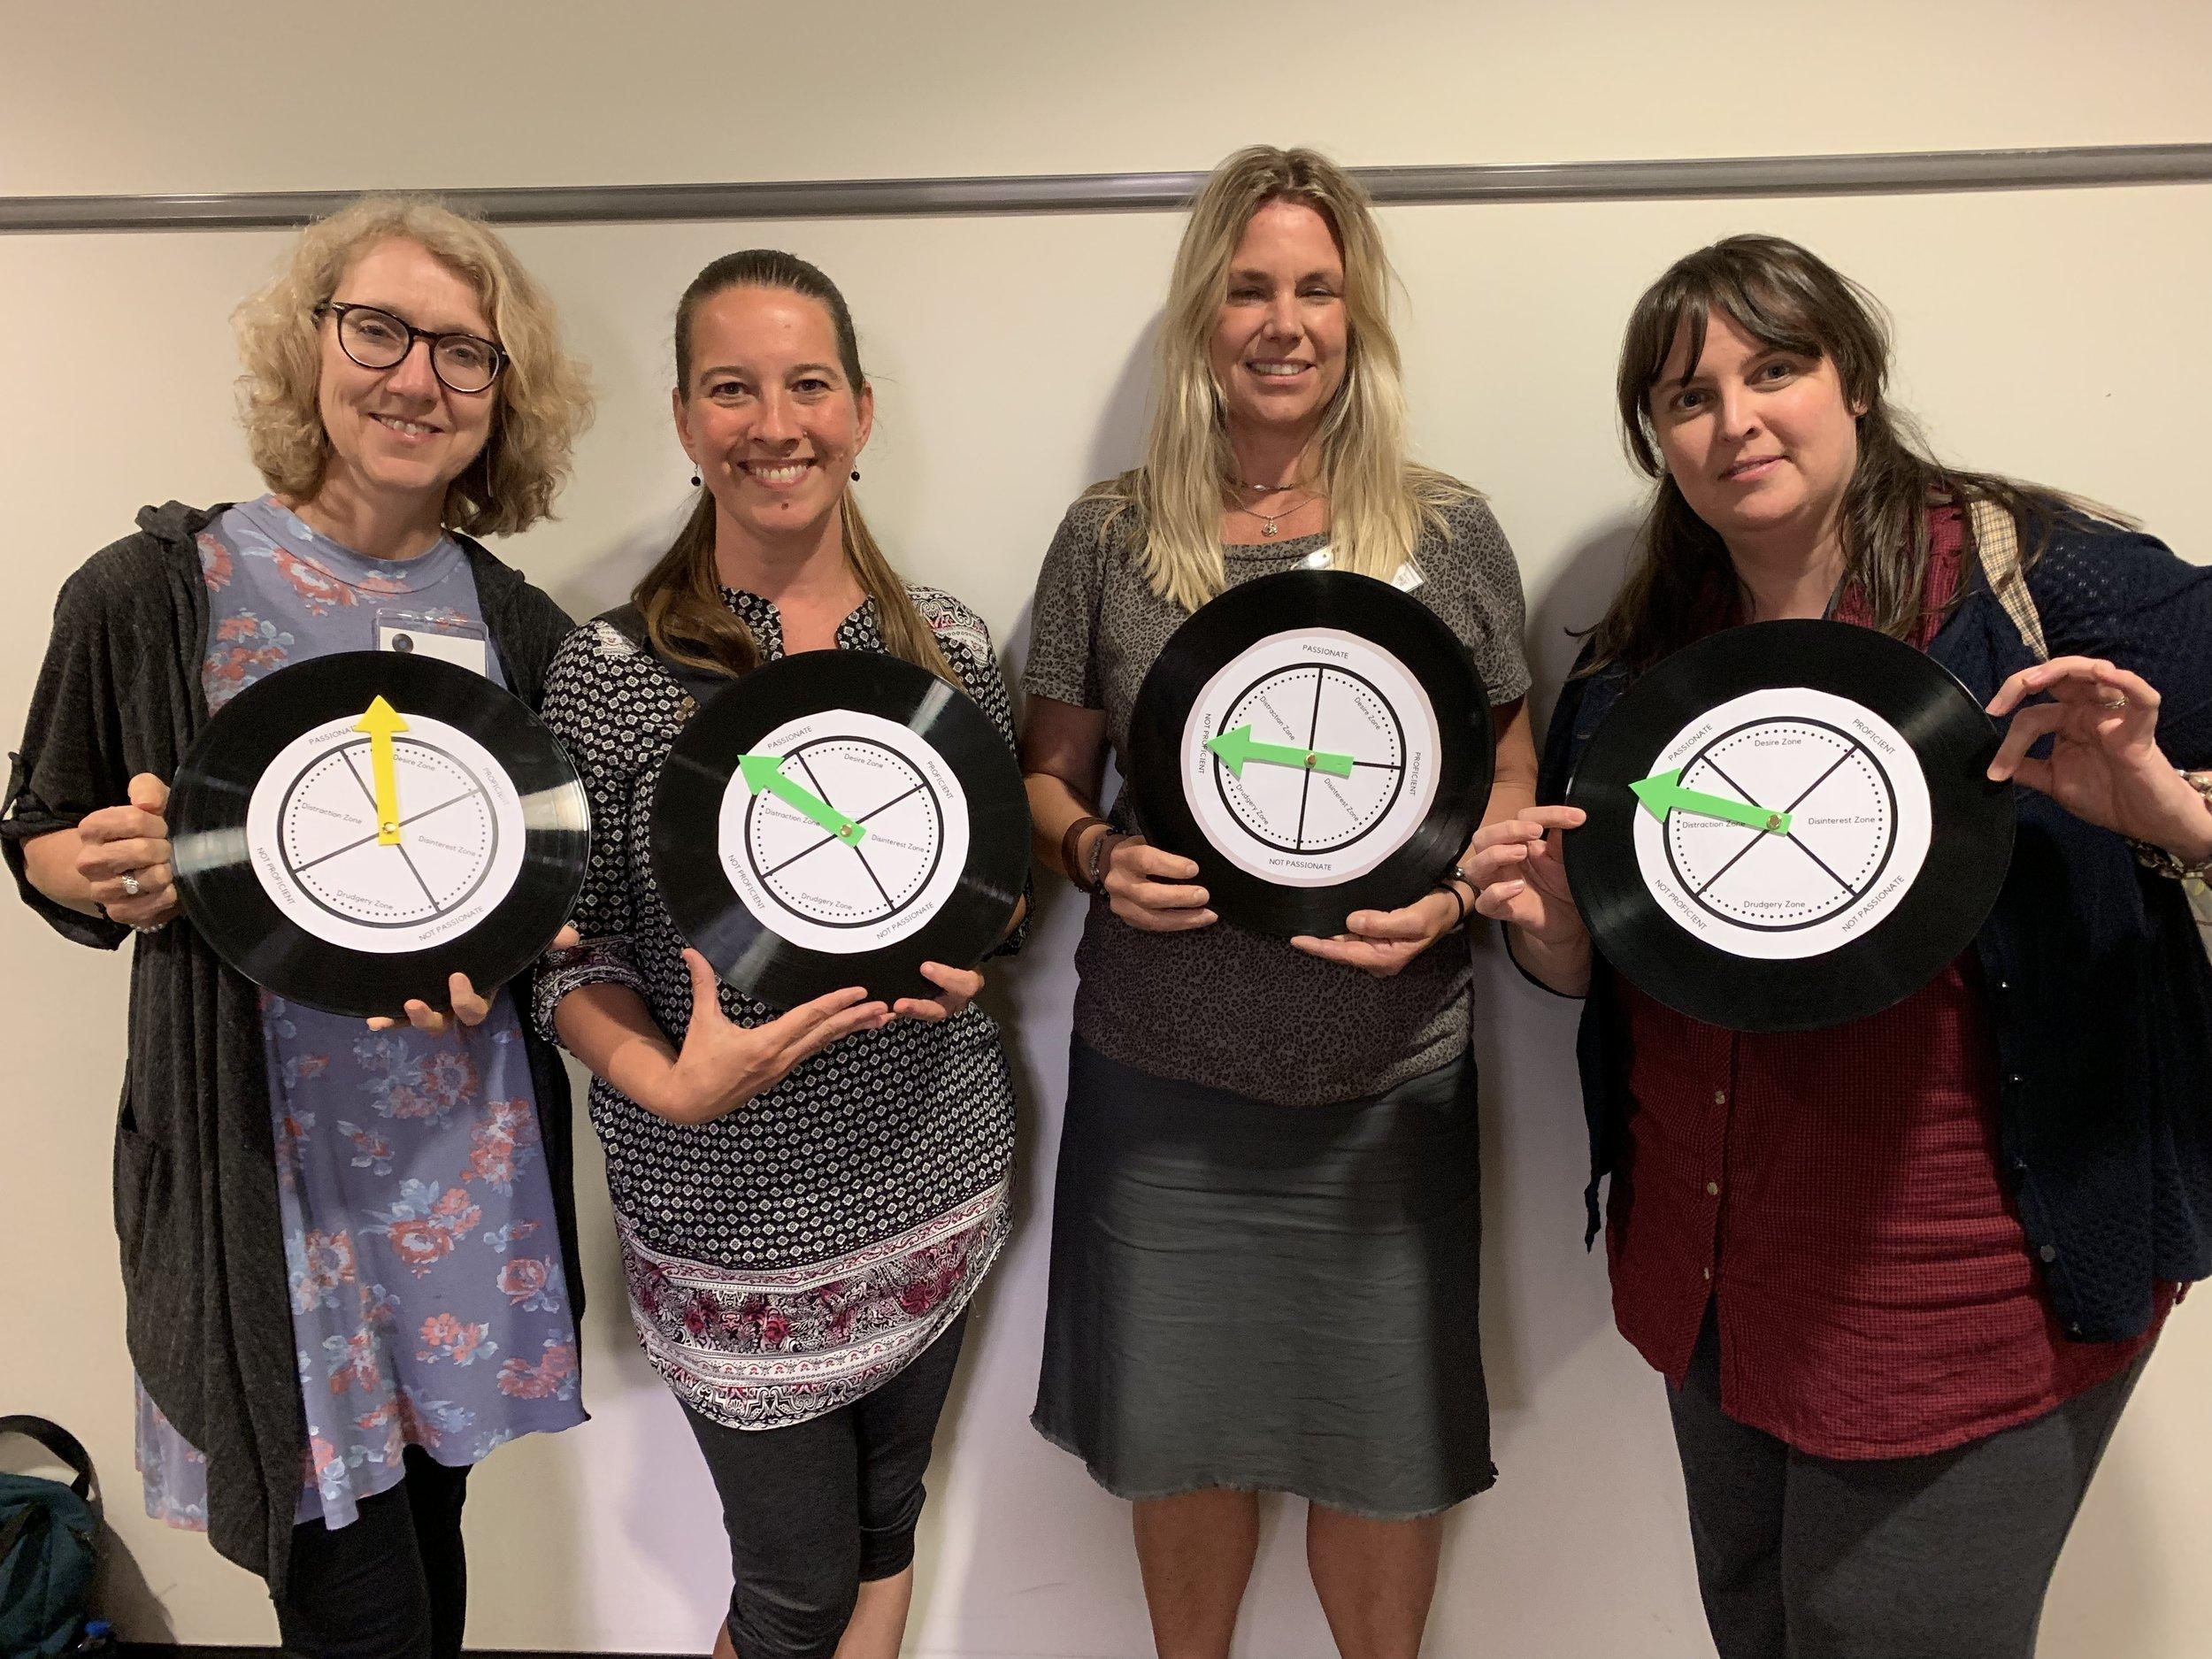 88 Creative Keys workshop teachers showcasing their freedom compasses.